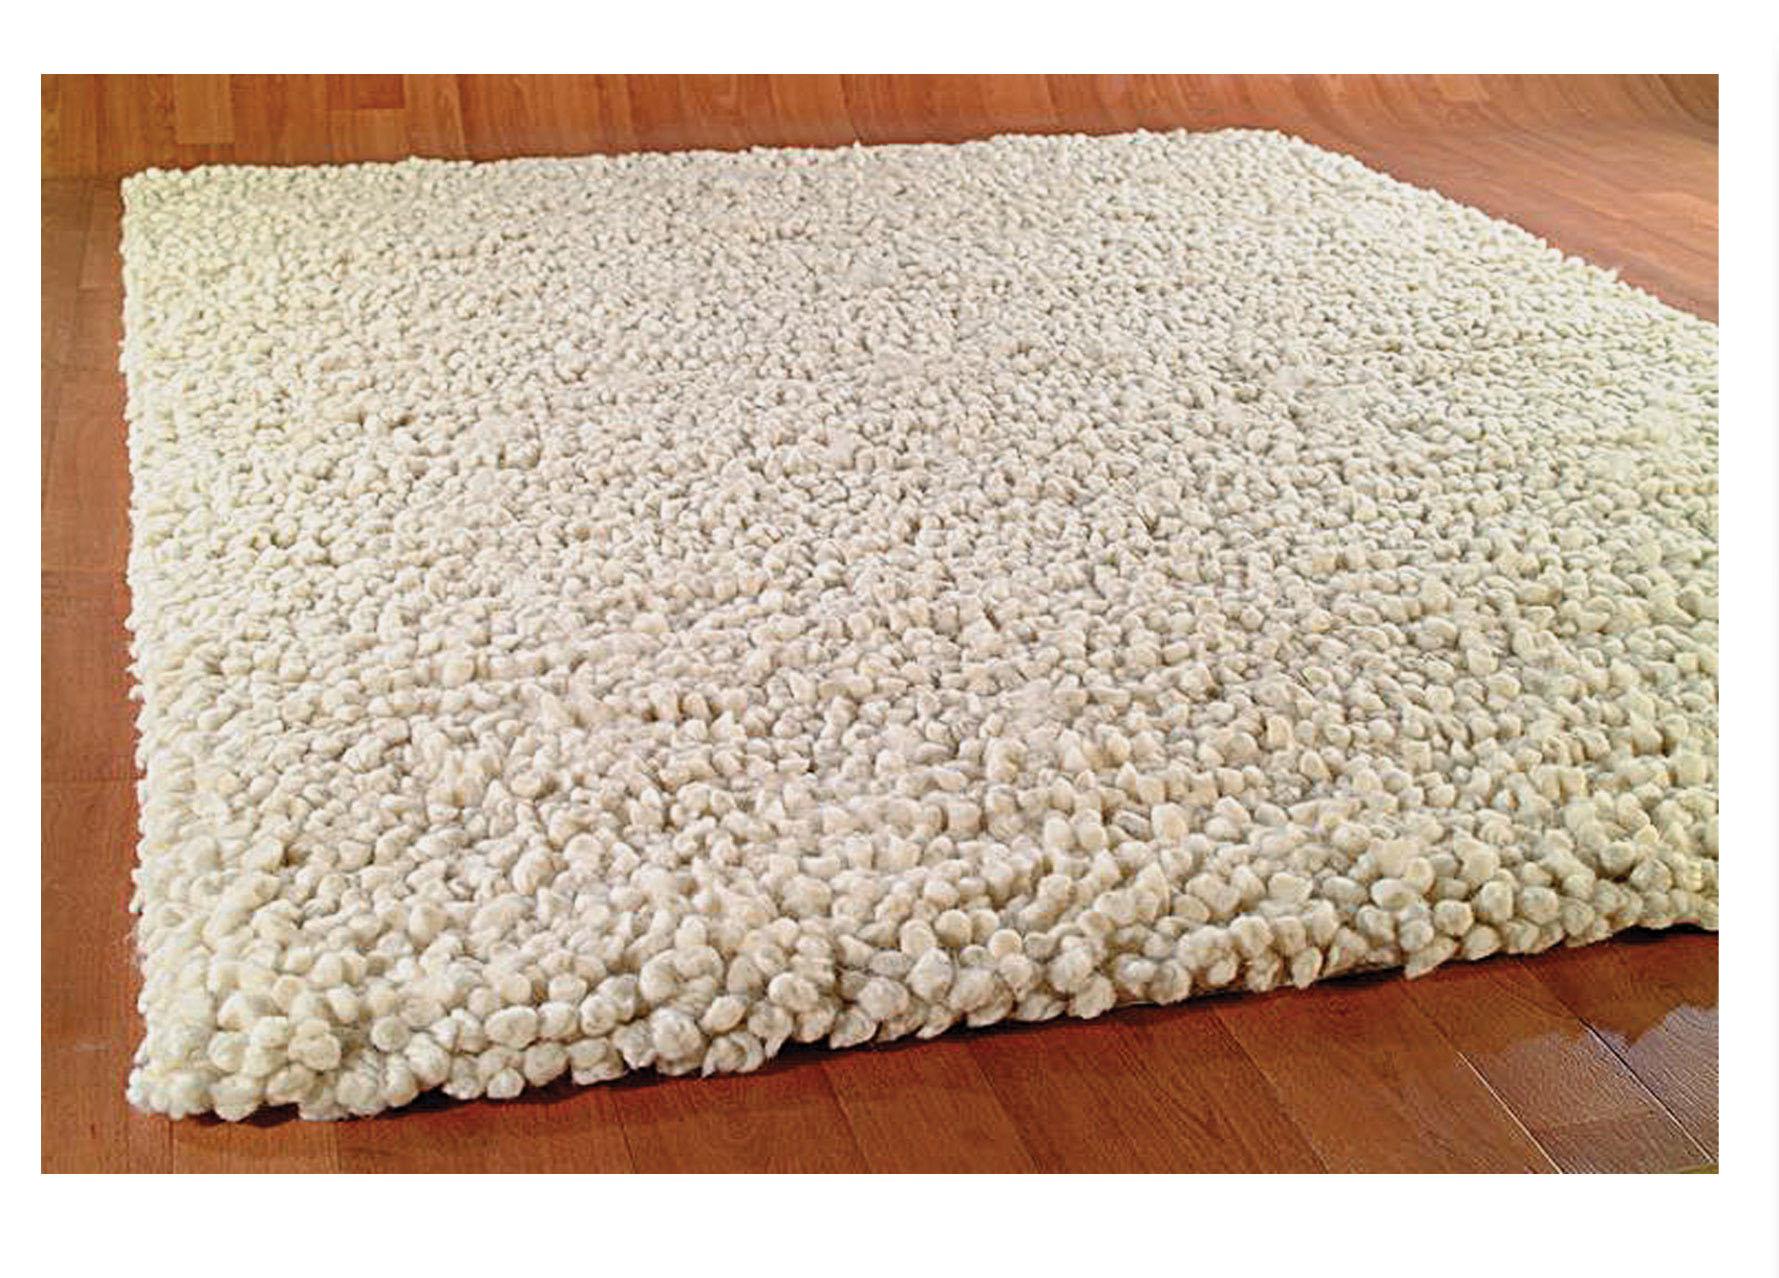 wool rugs store TDDJNSS